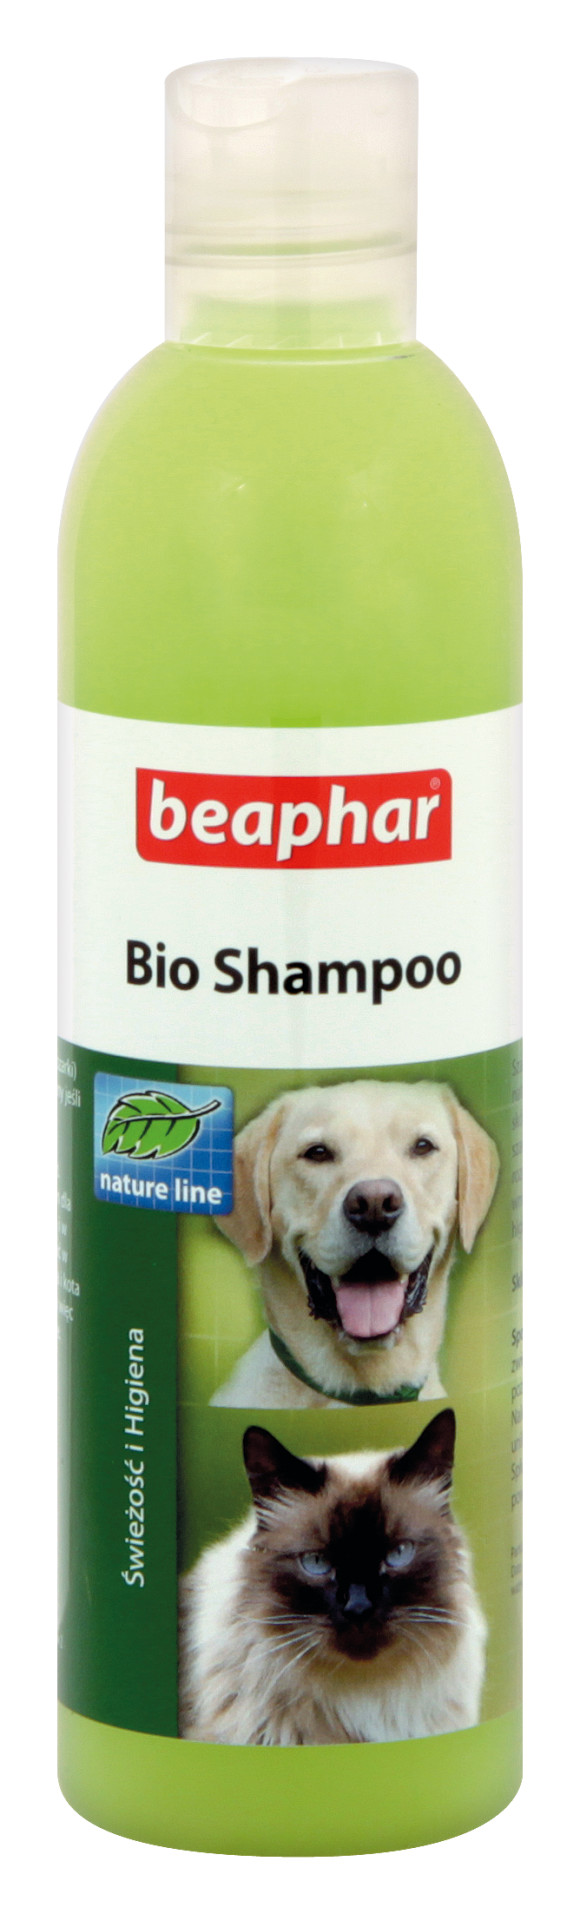 BEAPHAR BIO SHAMPOO szampon dla psa i kota